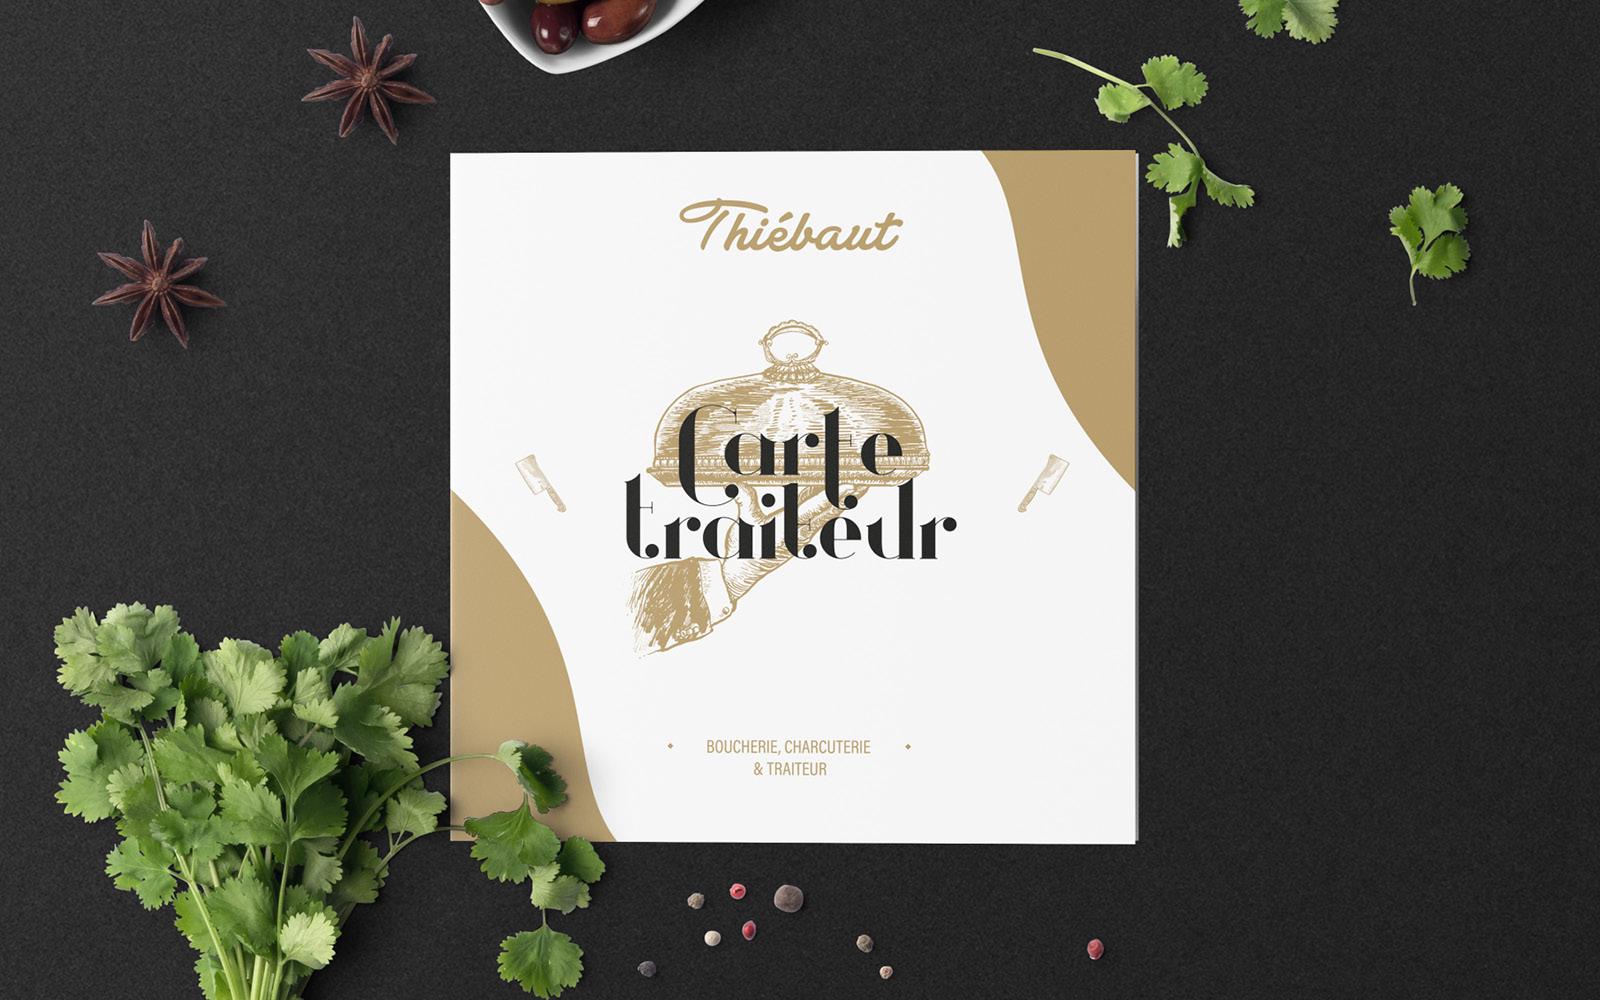 Josselin-tourette-Thiebaut-carte-2018